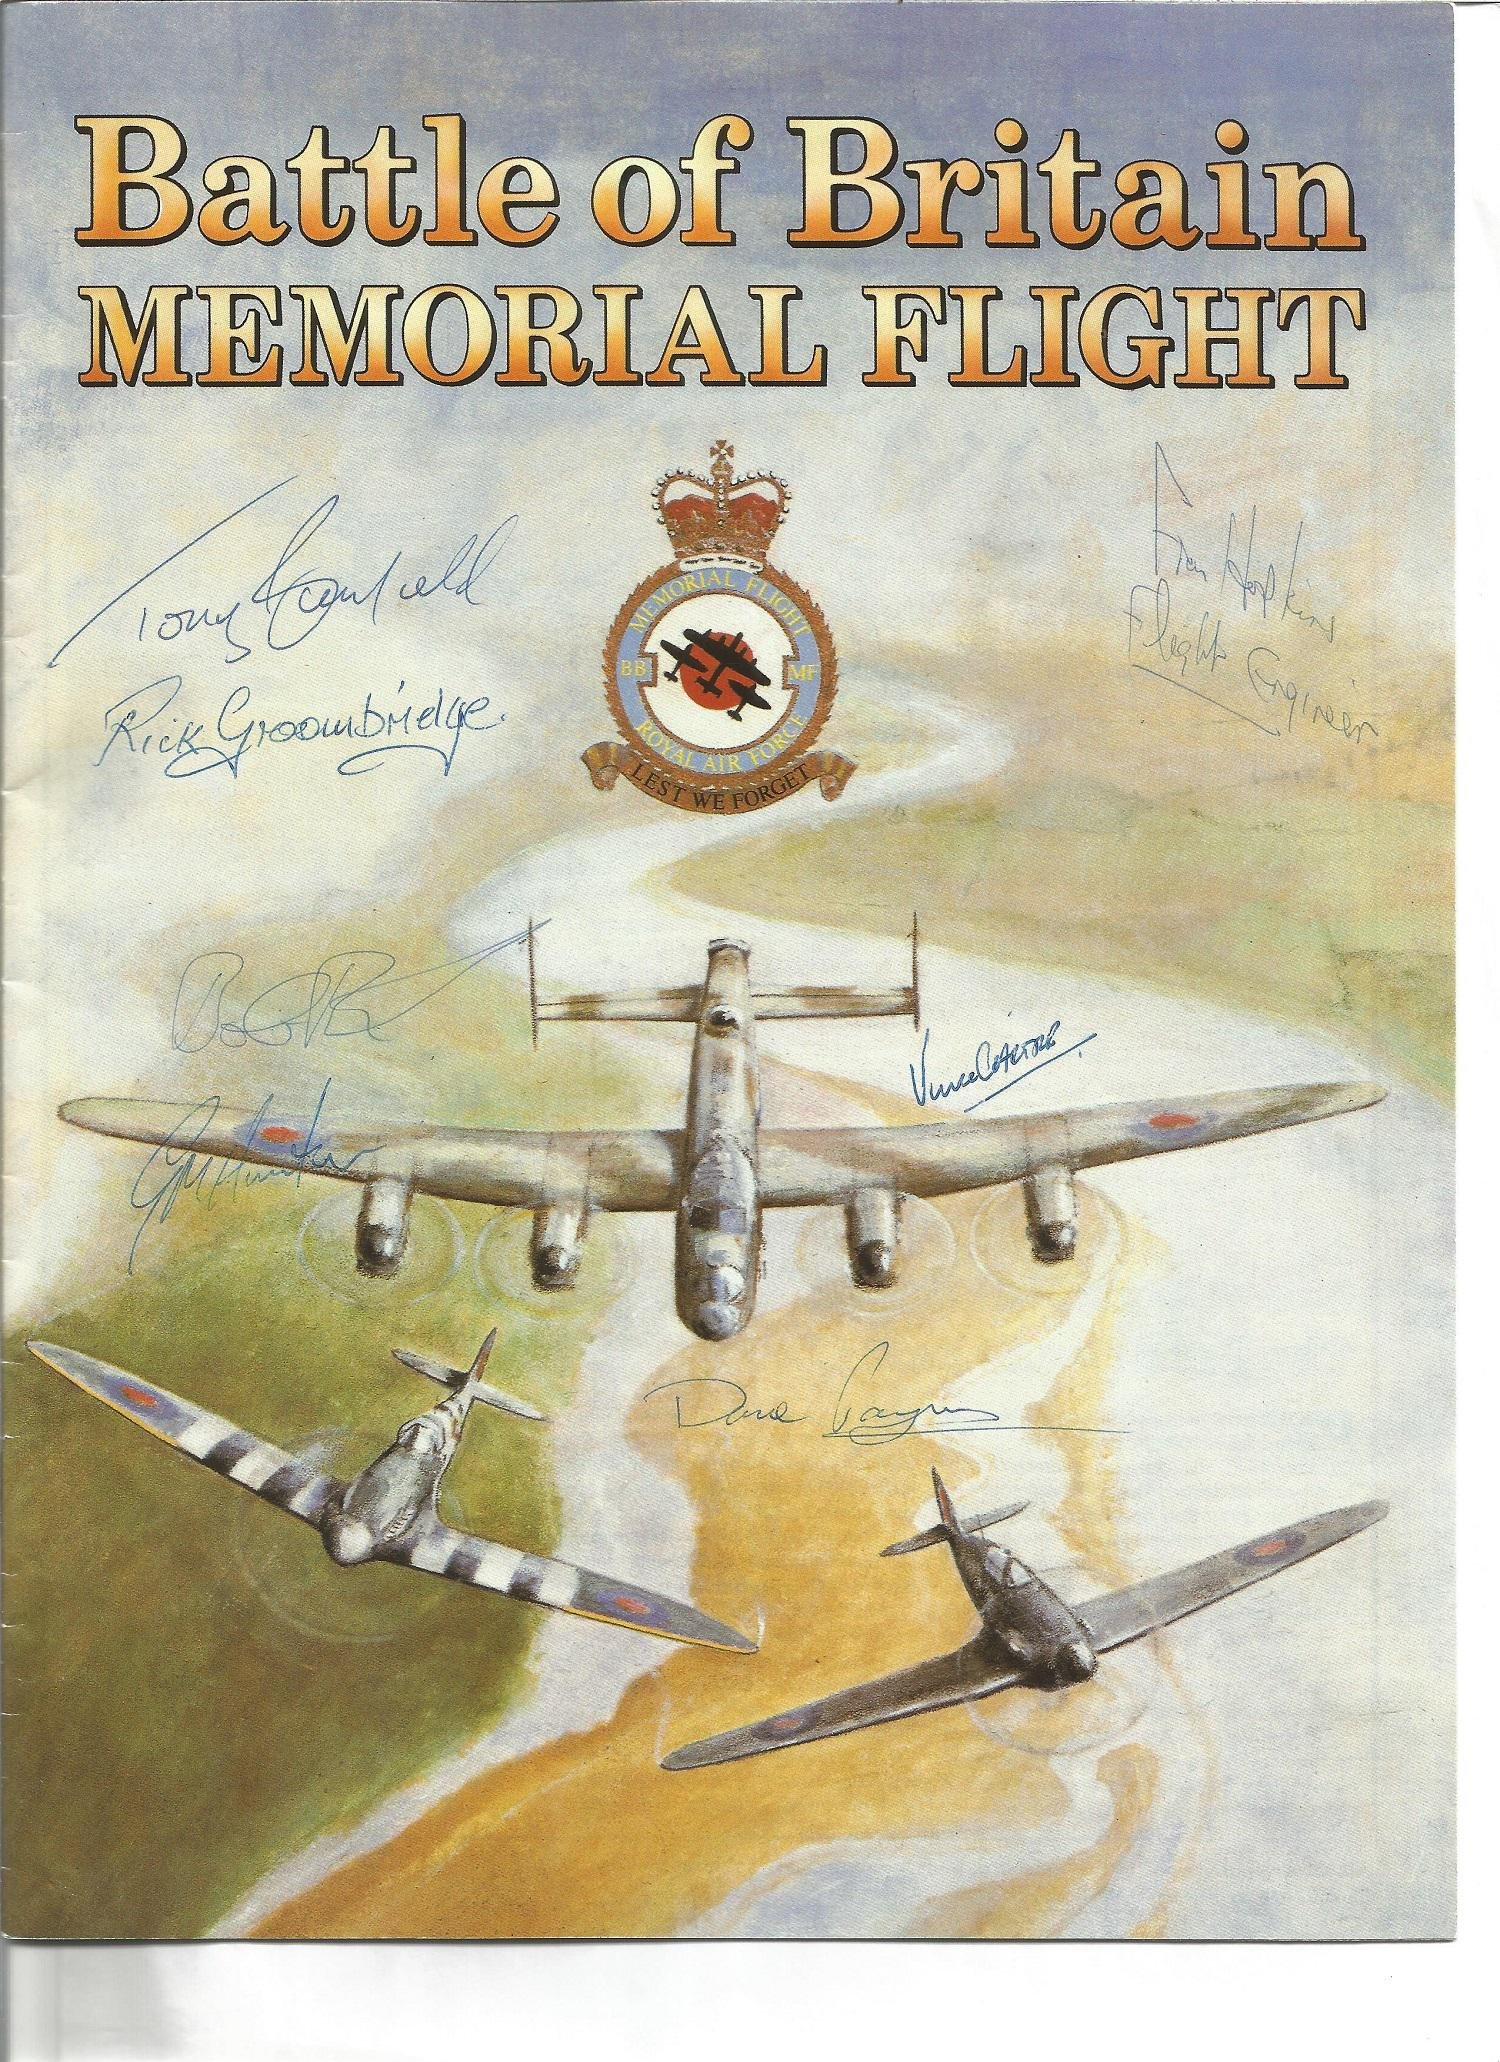 Battle of Britain Memorial flight brochure multiple